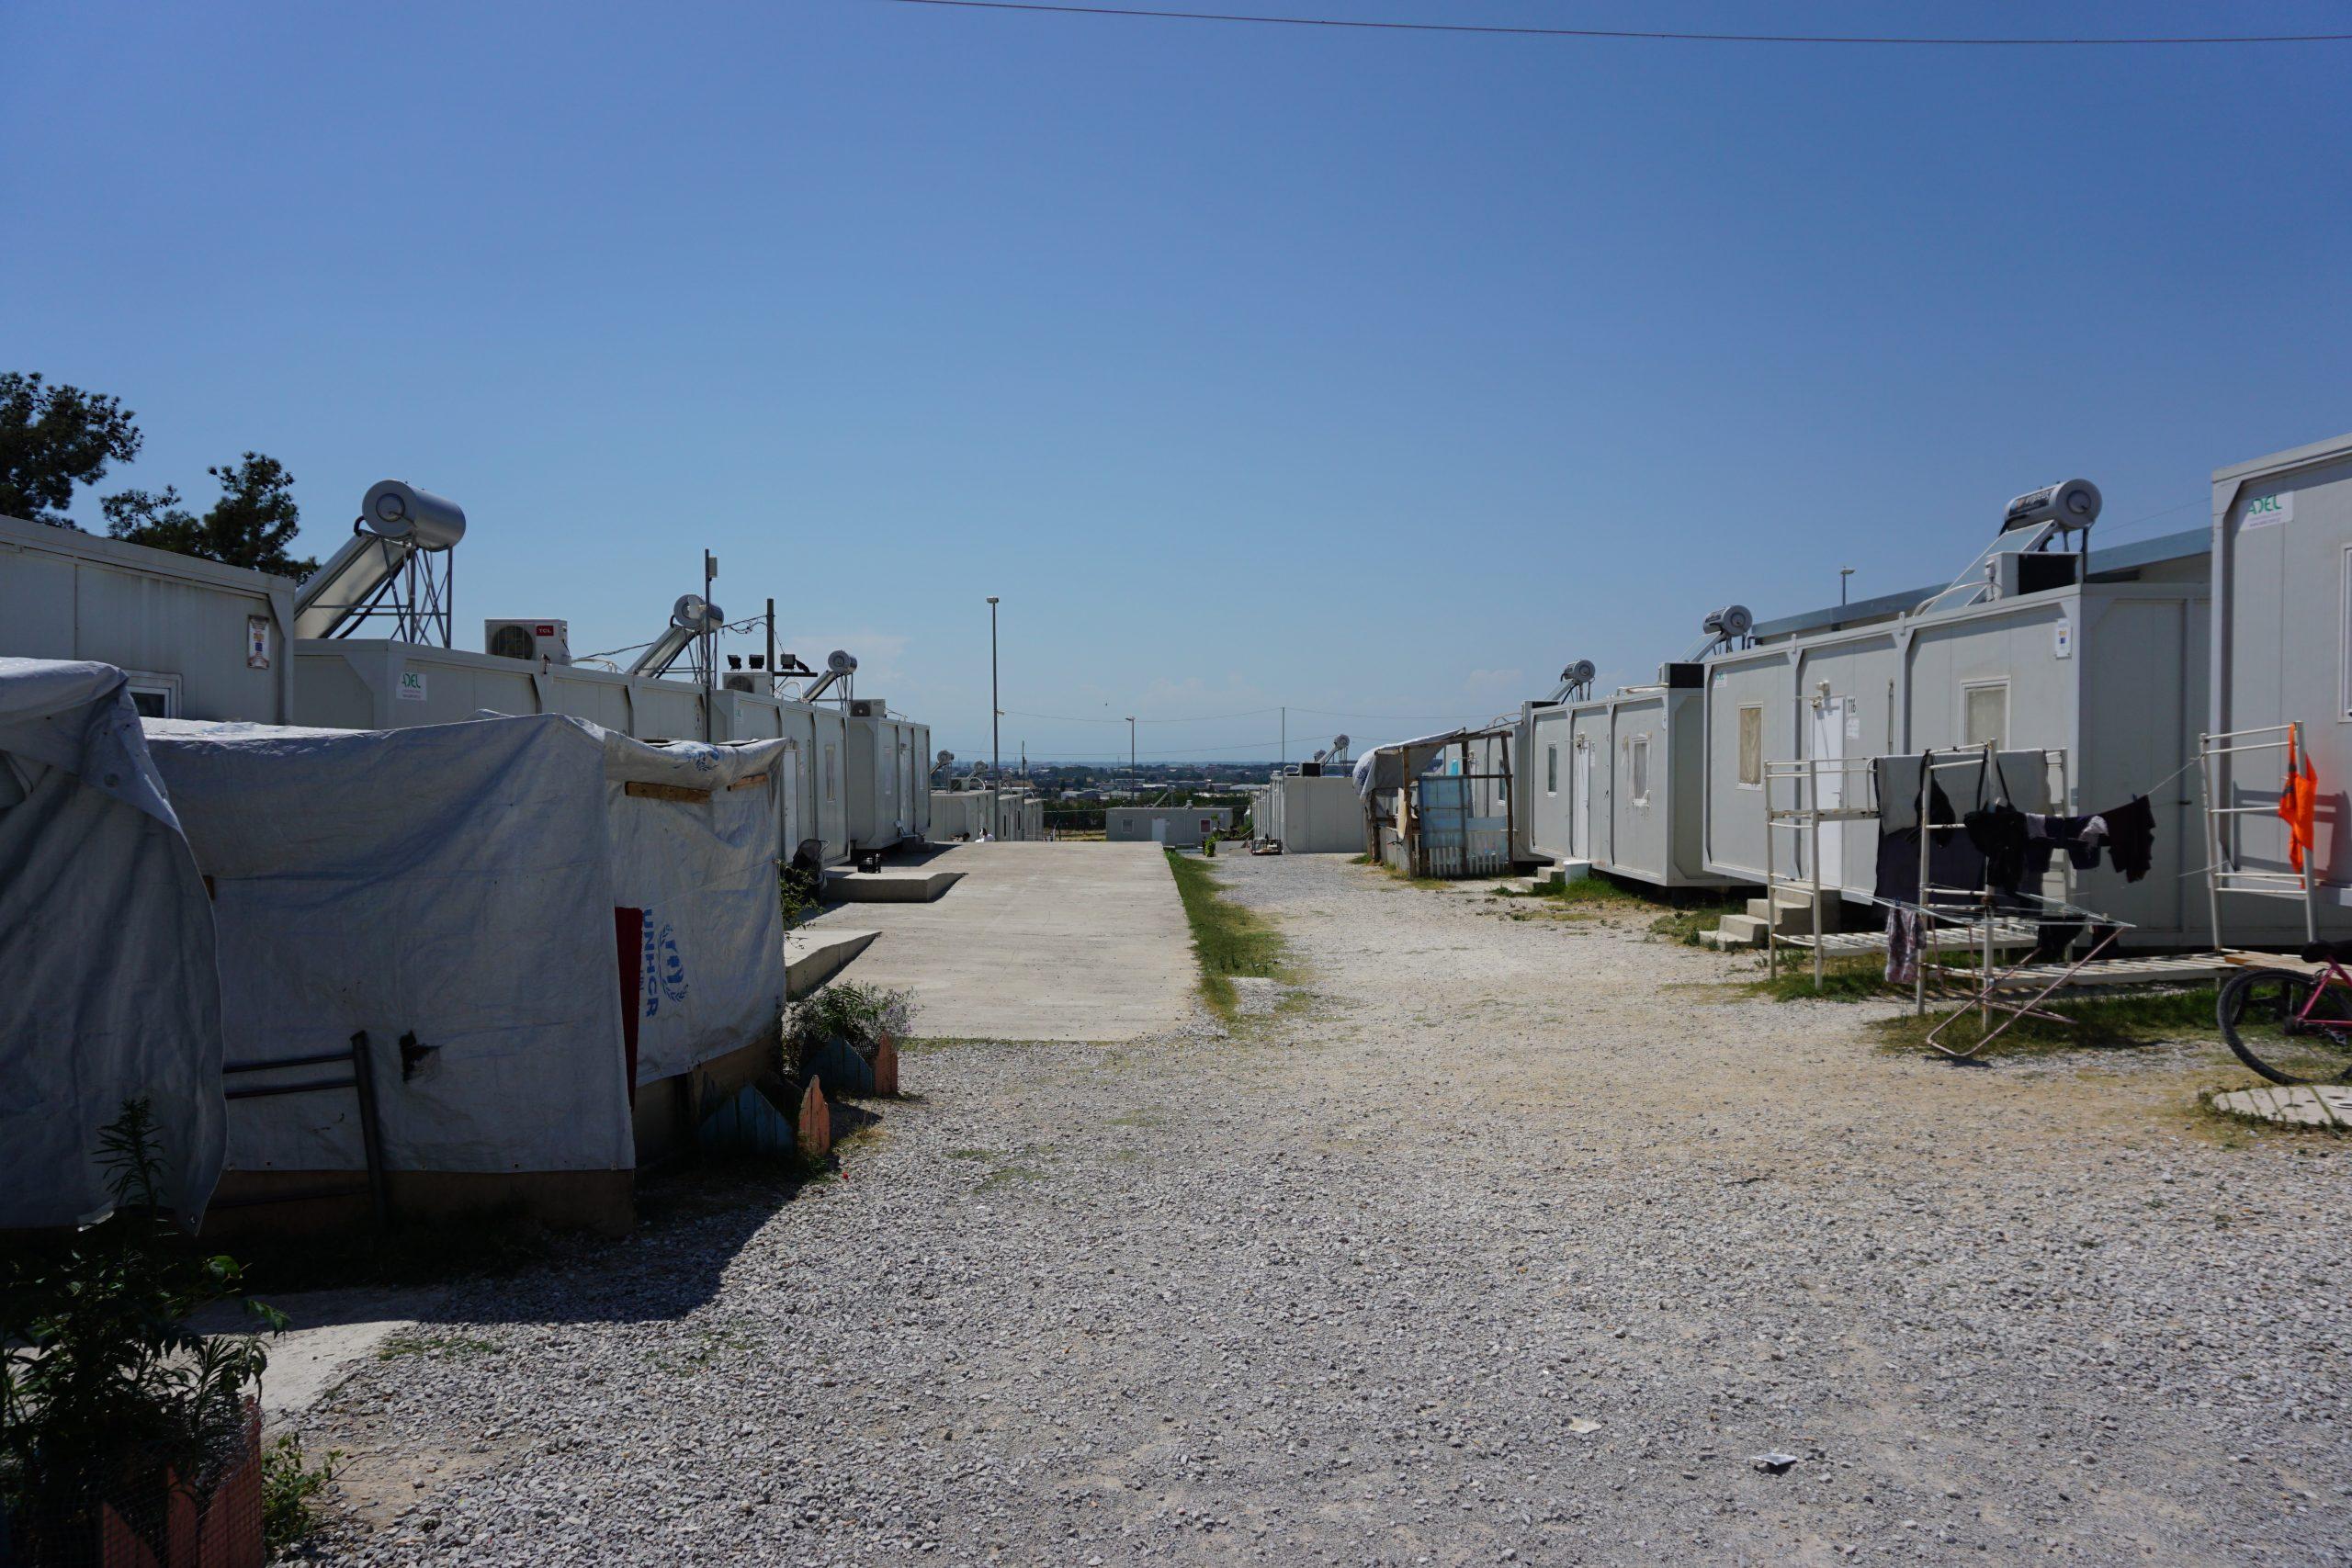 Kontenery UNHCR